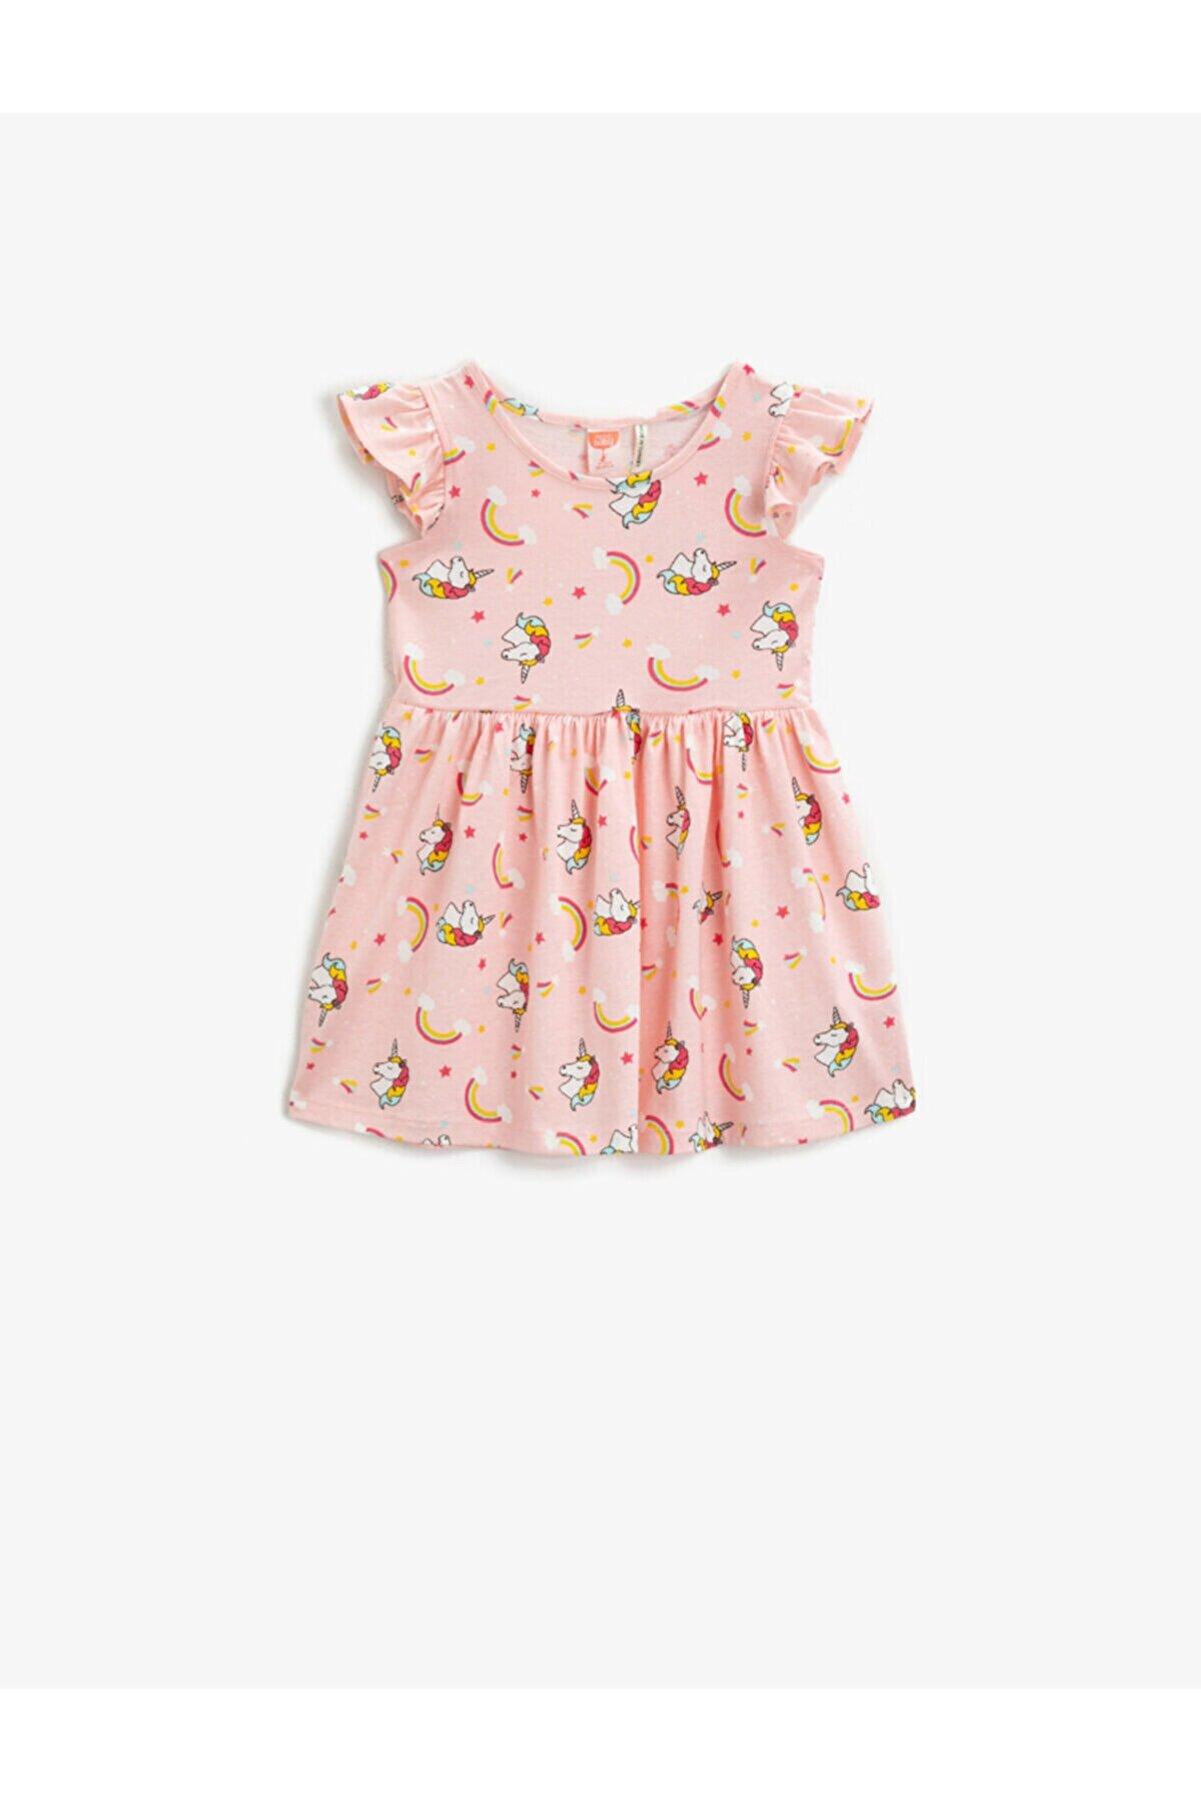 Koton Kız Bebek Elbise Baskili Firfirli